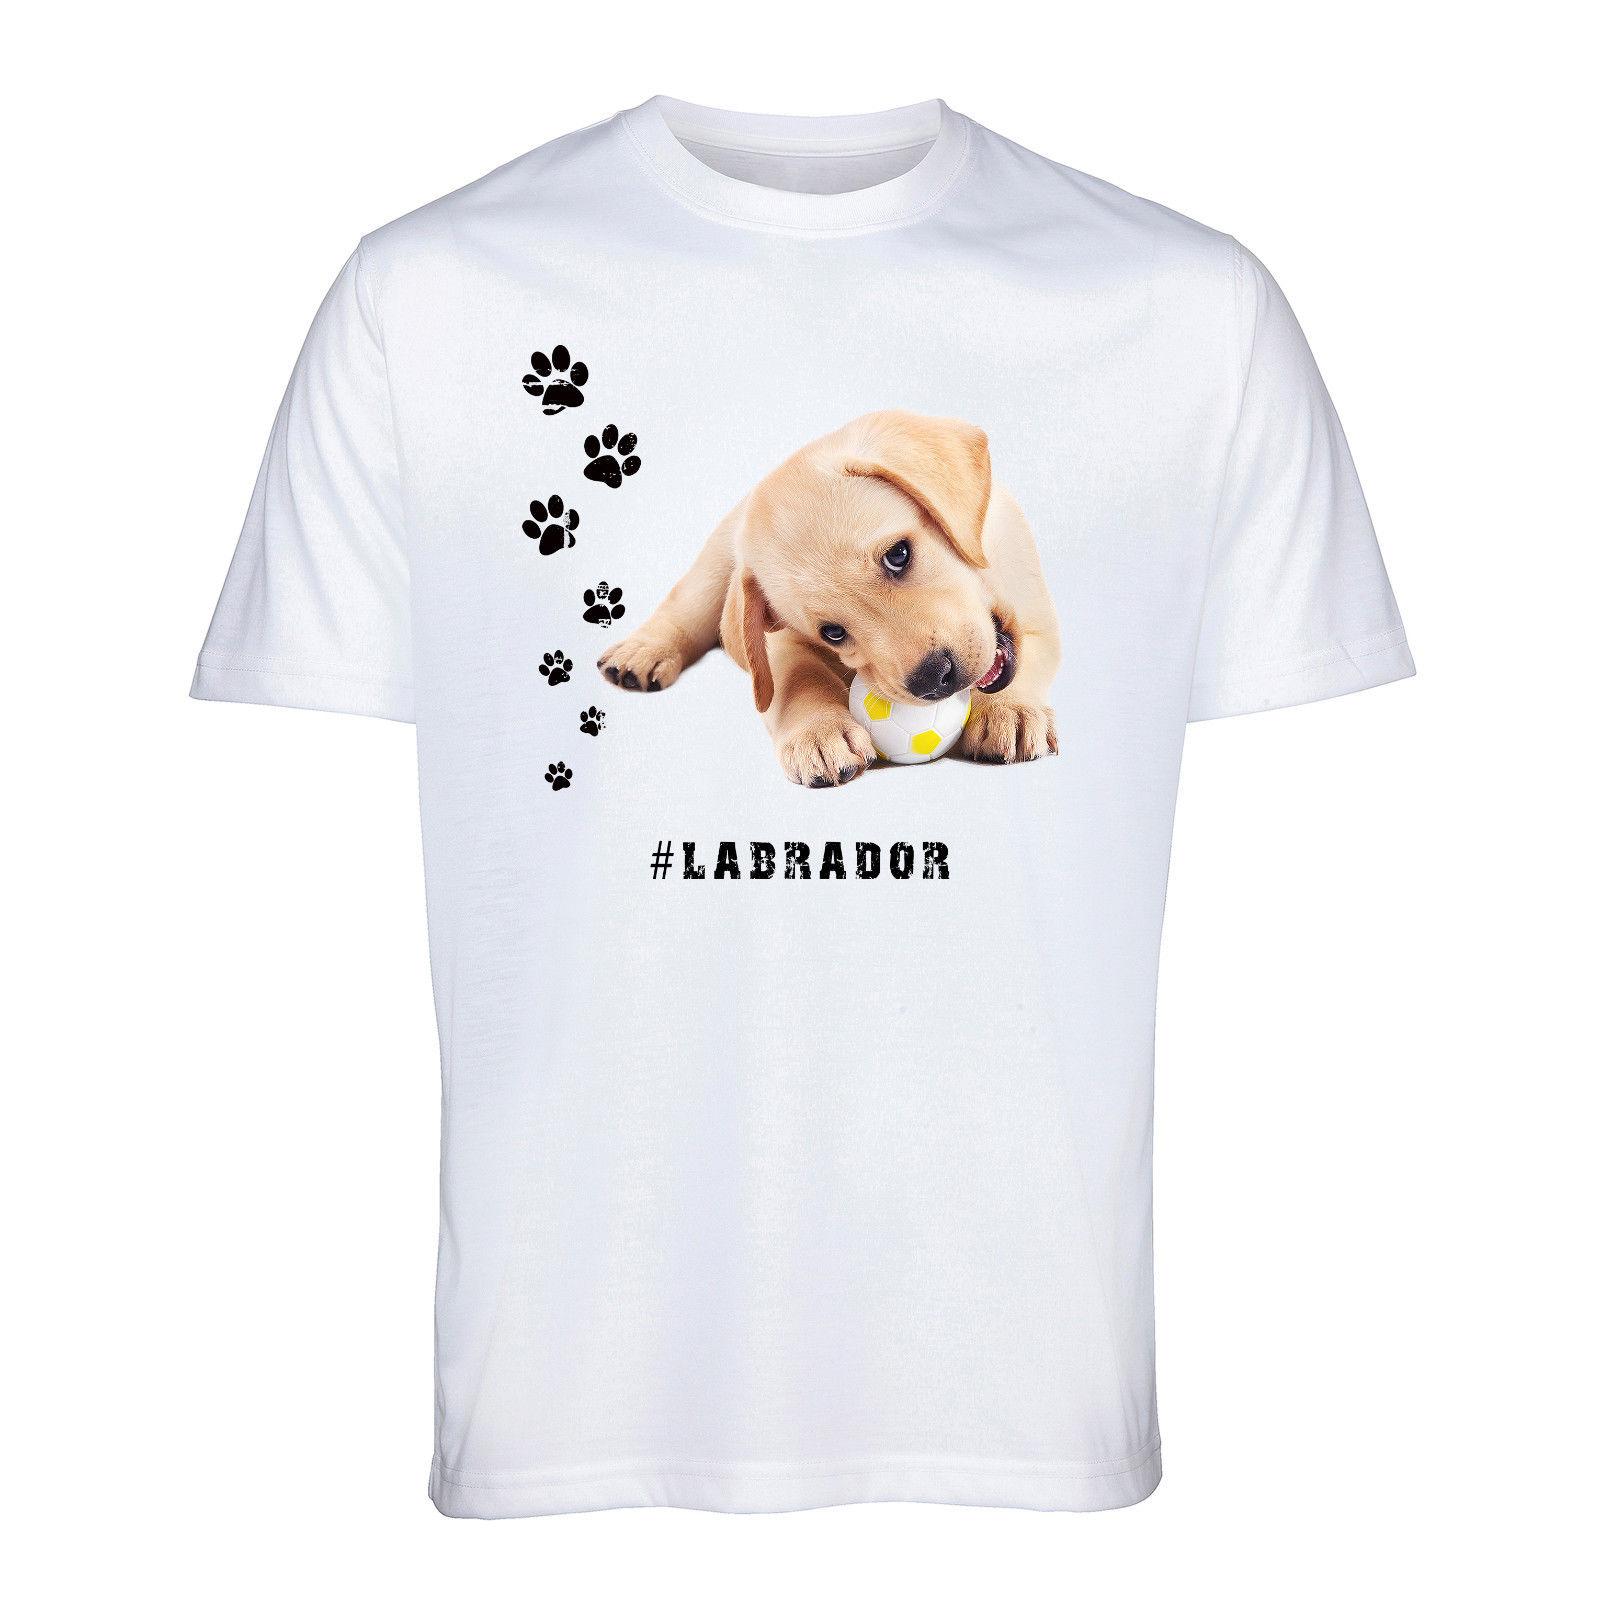 Camiseta de Labrador Retriever Hashtag perro raza Animal mascota hombres mujeres divertido regalo camiseta de dibujos animados hombres Unisex nueva camiseta de moda